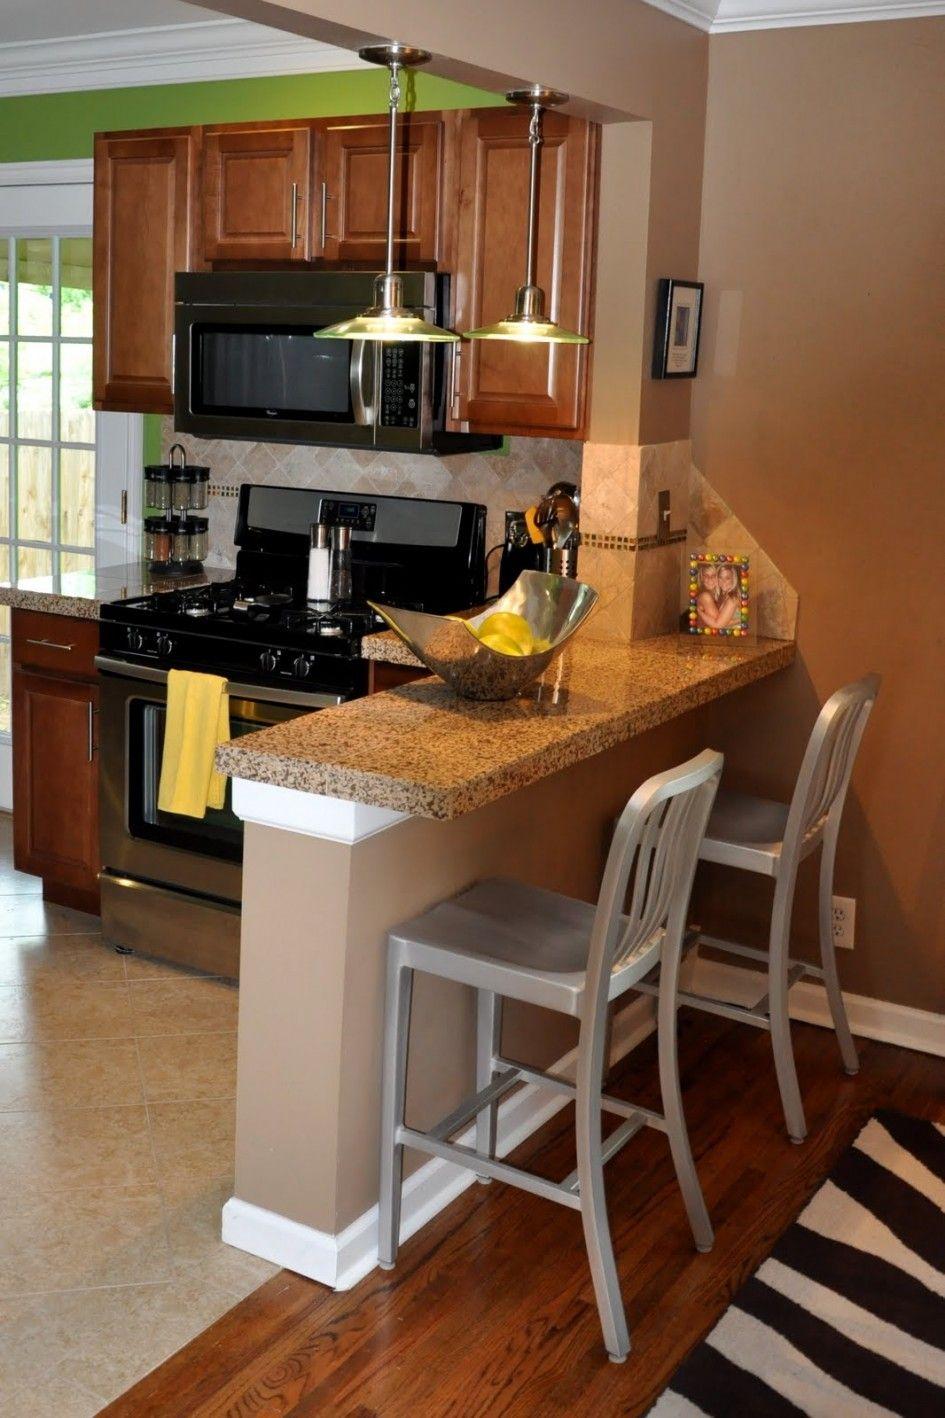 Small breakfast bar idea for tiny kitchen Kitchen design